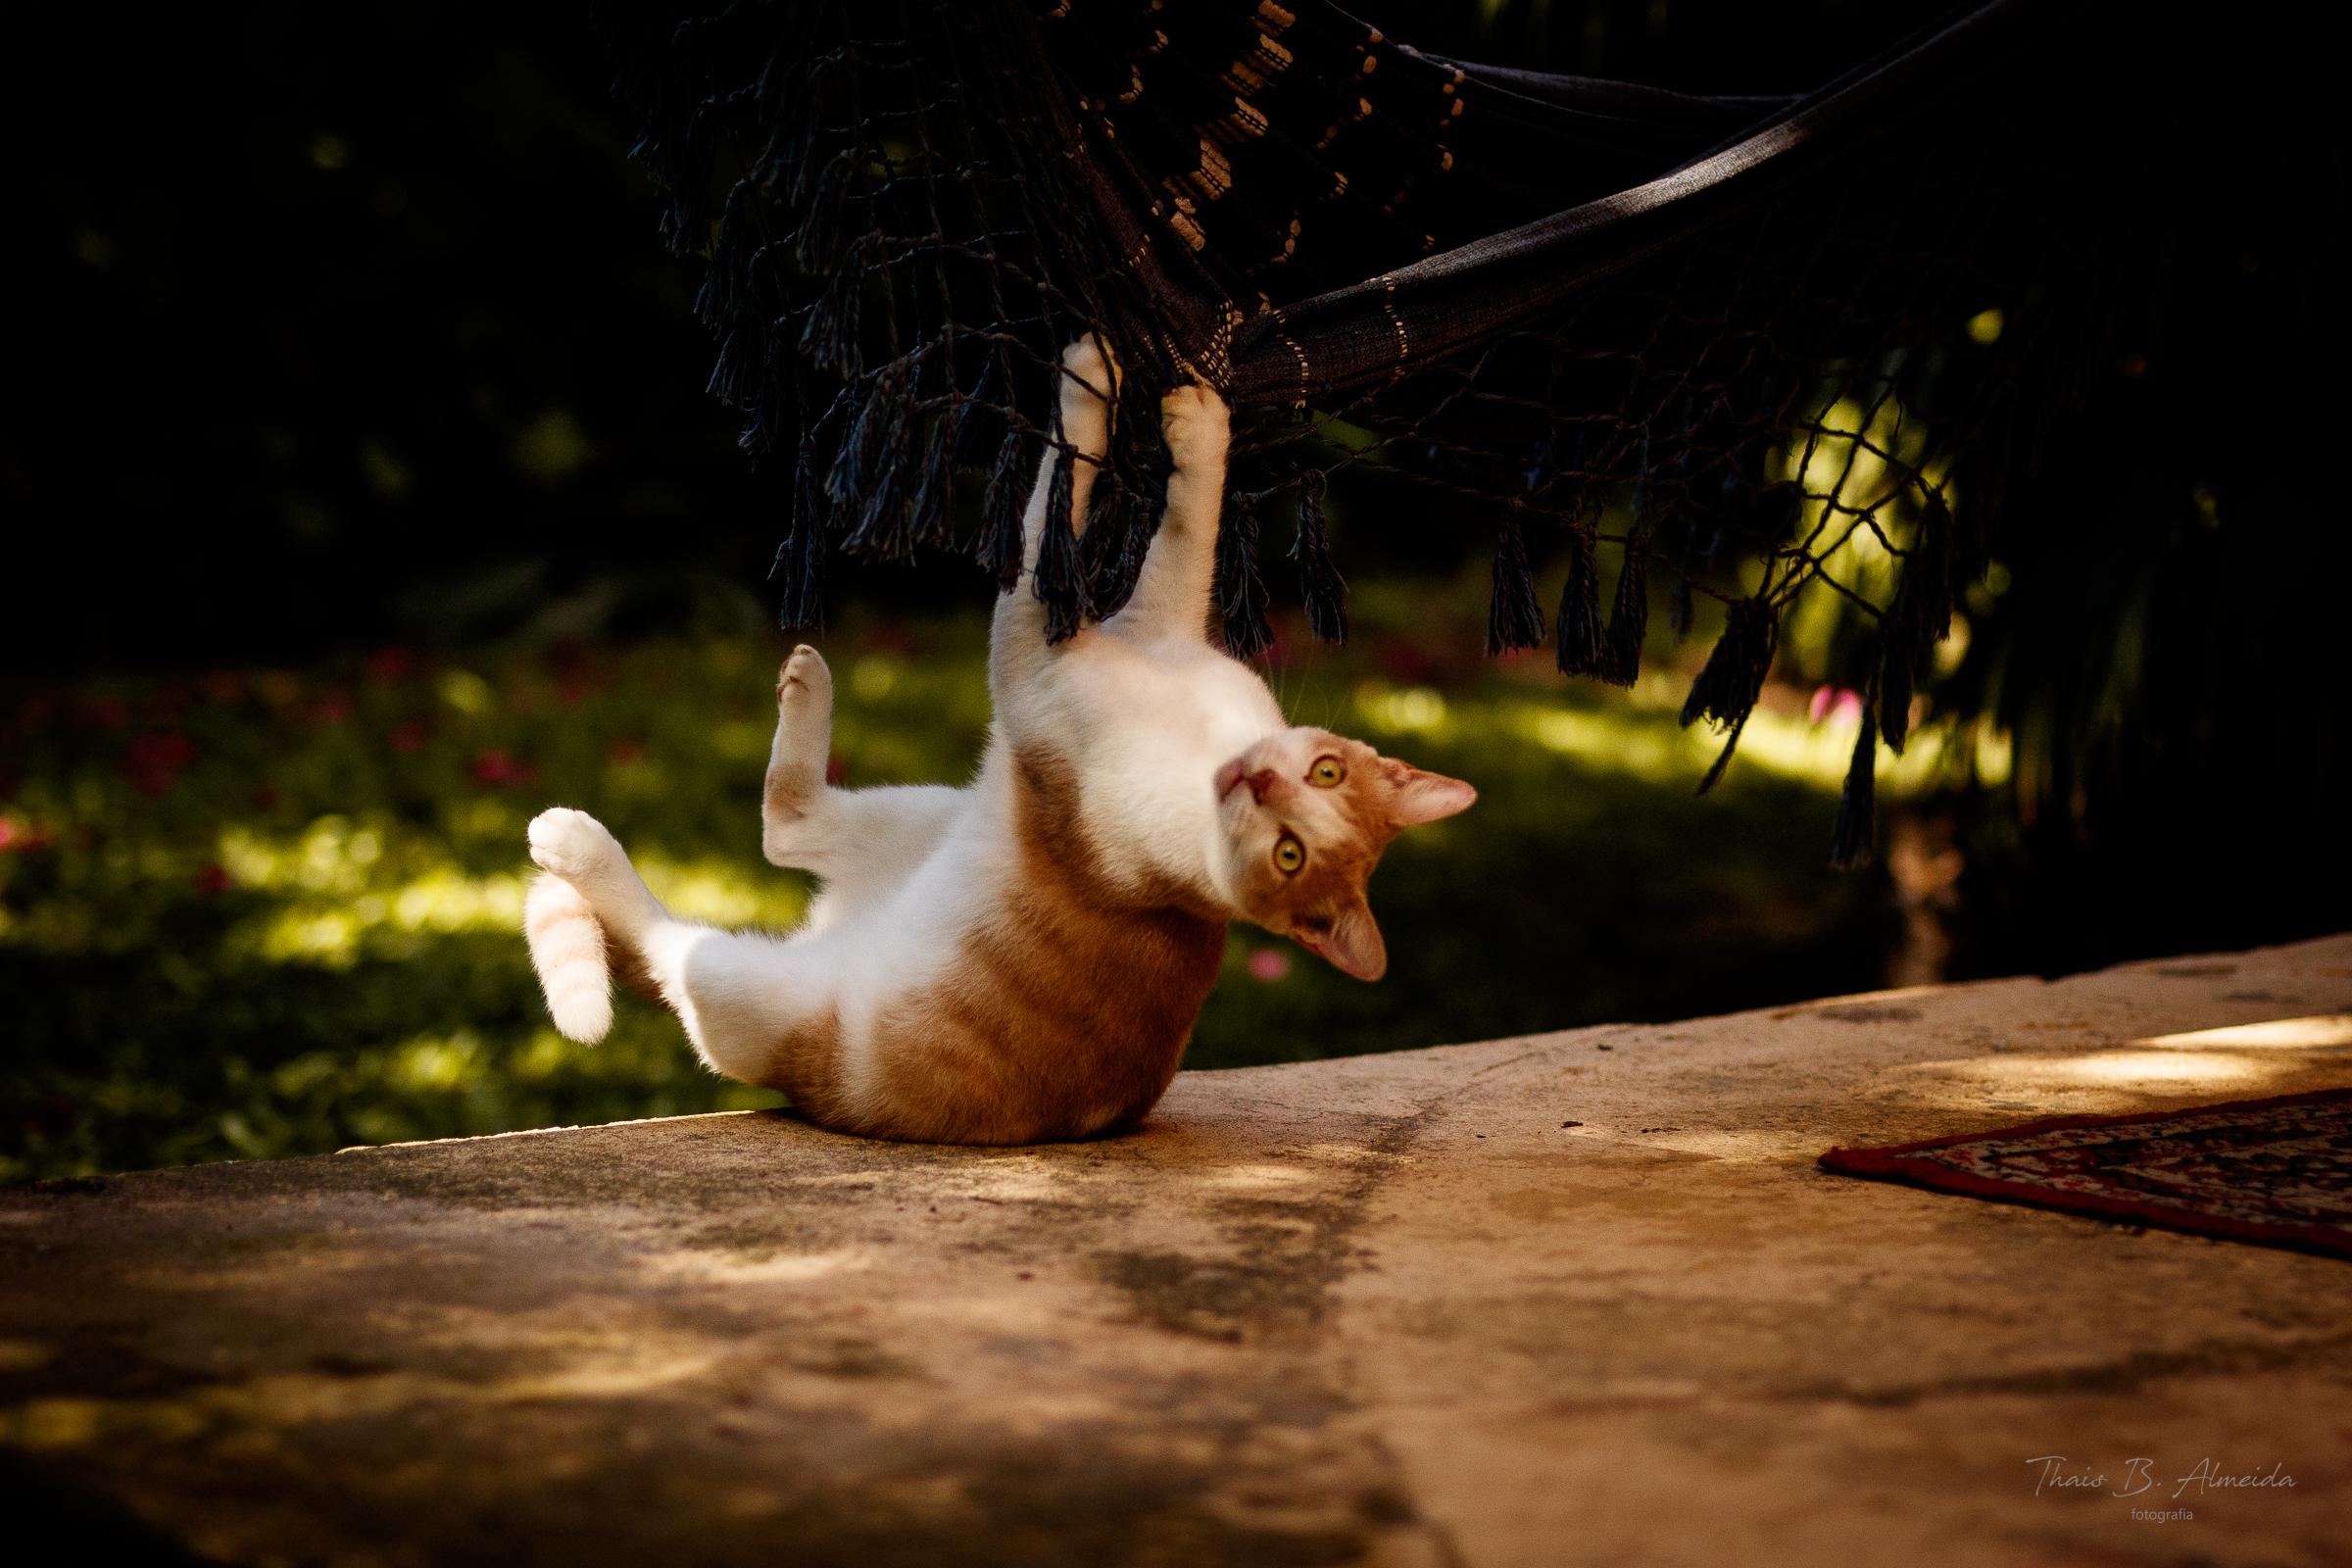 projeto gatinho zen - mexirica